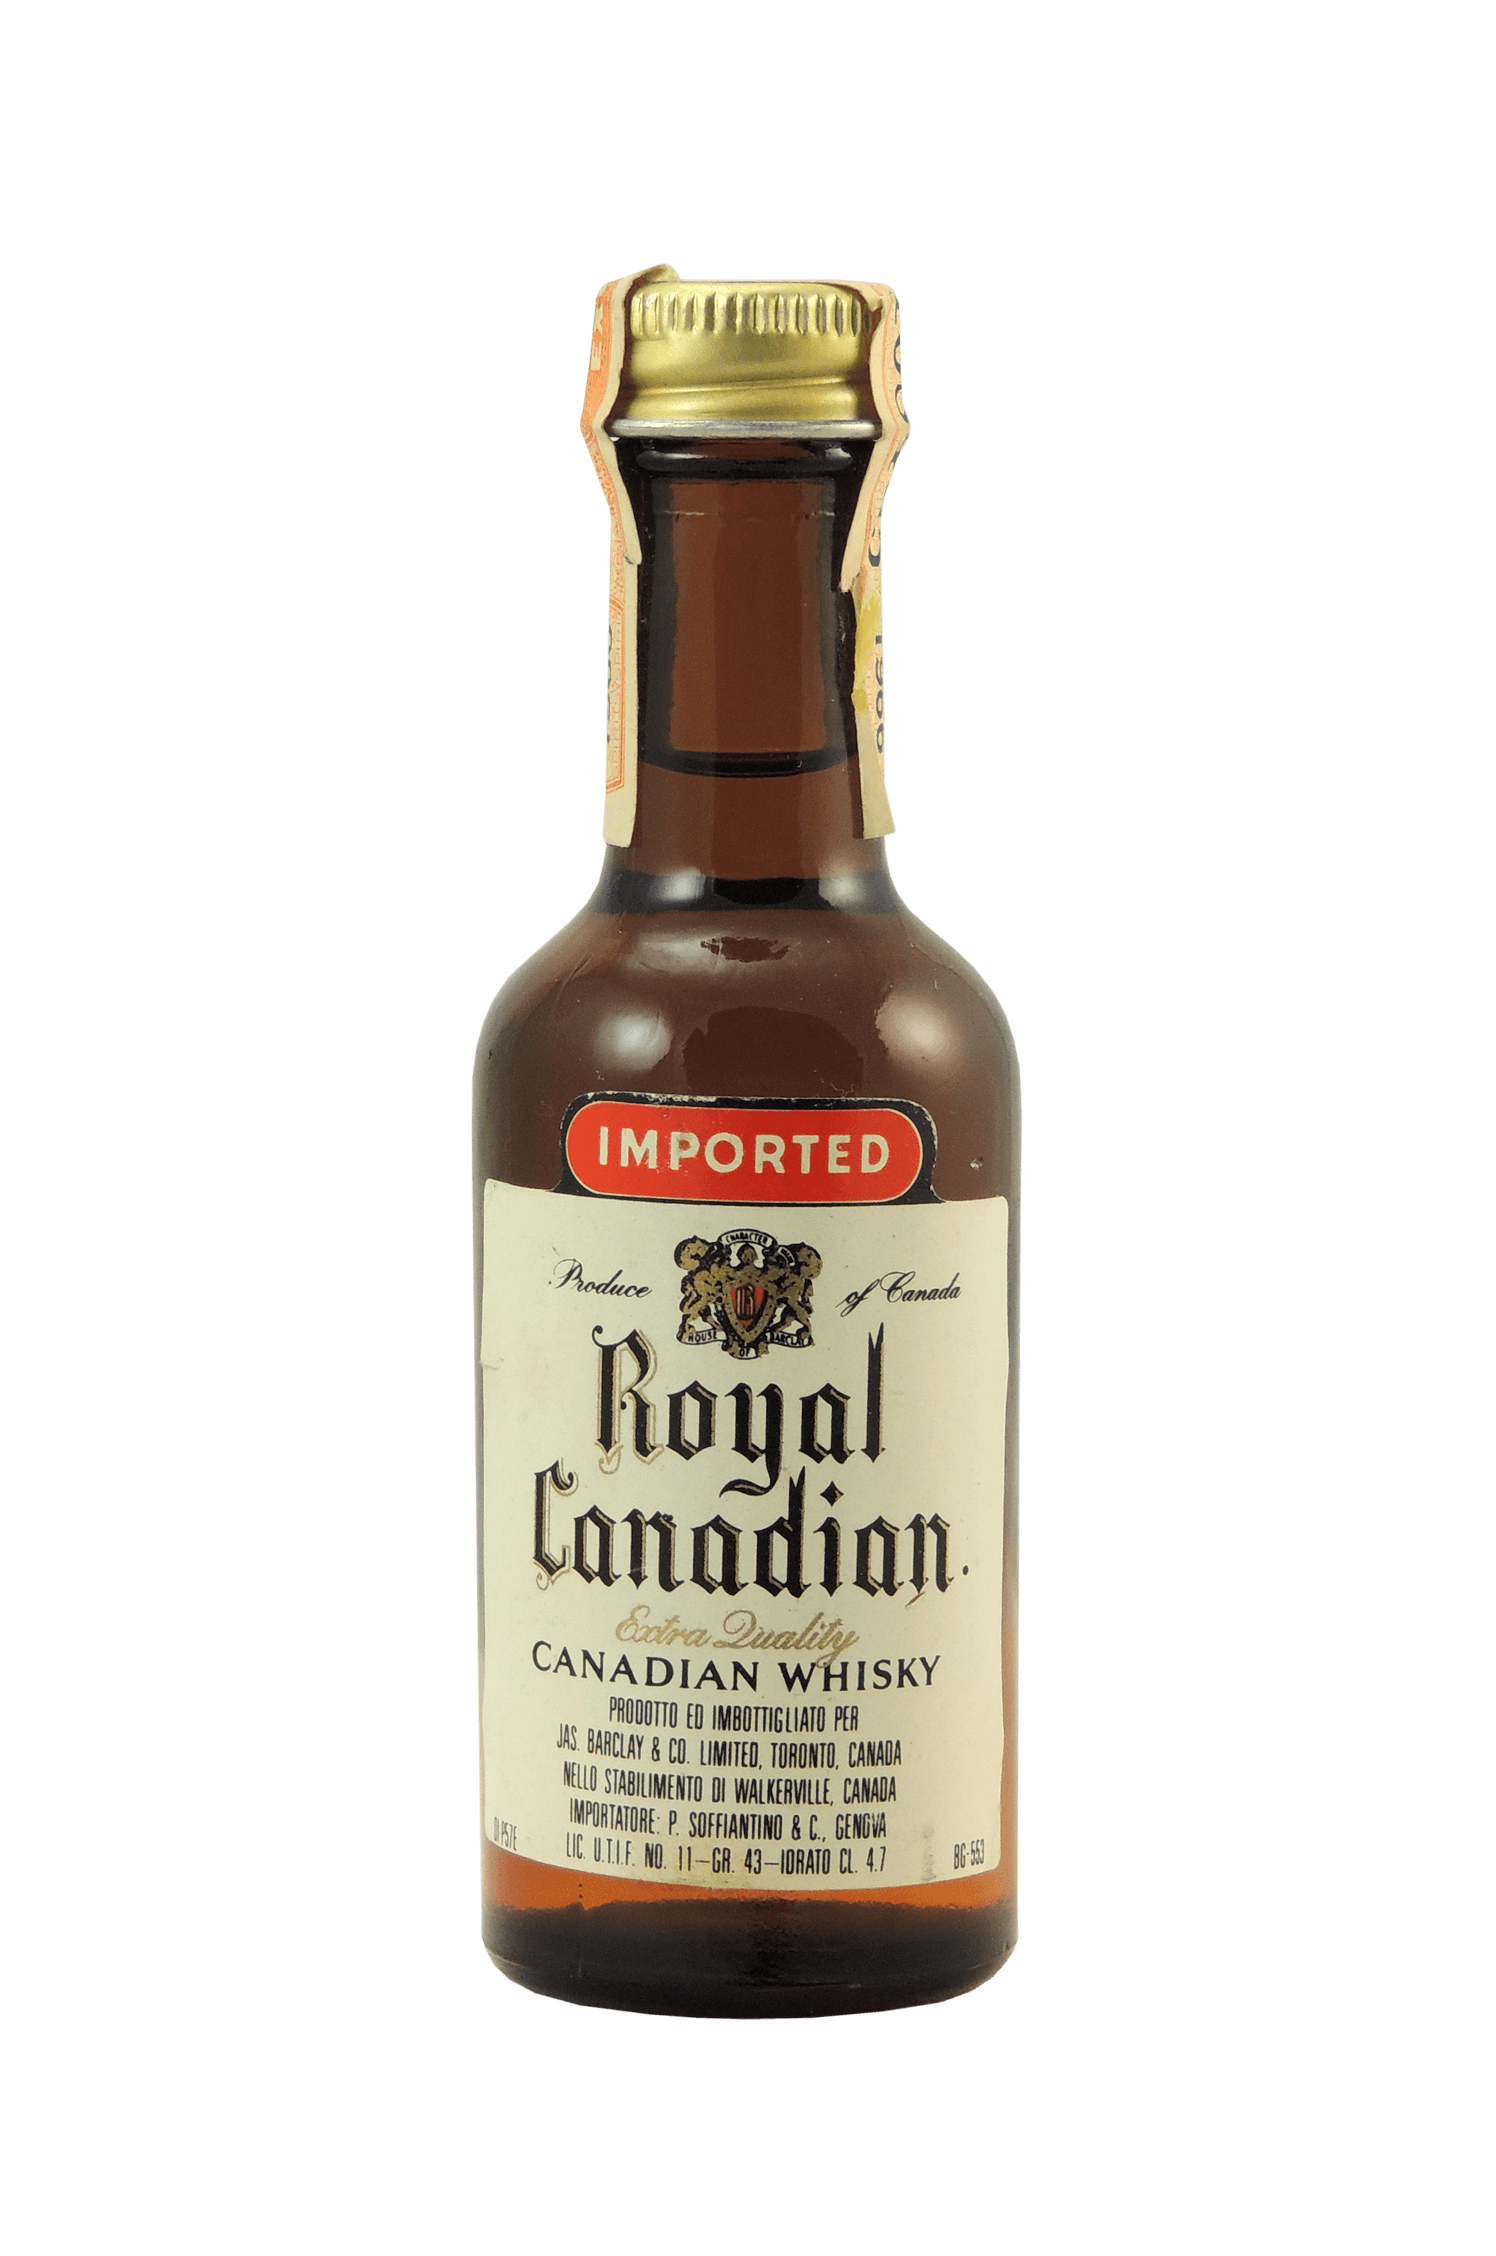 Royal Canadian Whisky